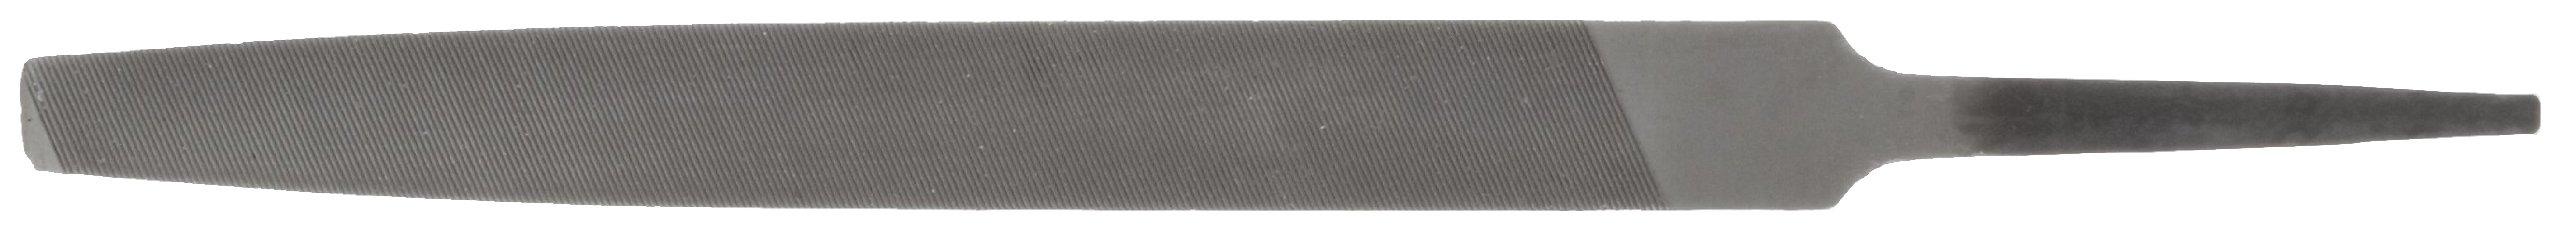 PFERD Mill Hand File, American Pattern, Single Cut, Rectangular, Medium, 10'' Length, 31/32'' Width, 11/64'' Thickness